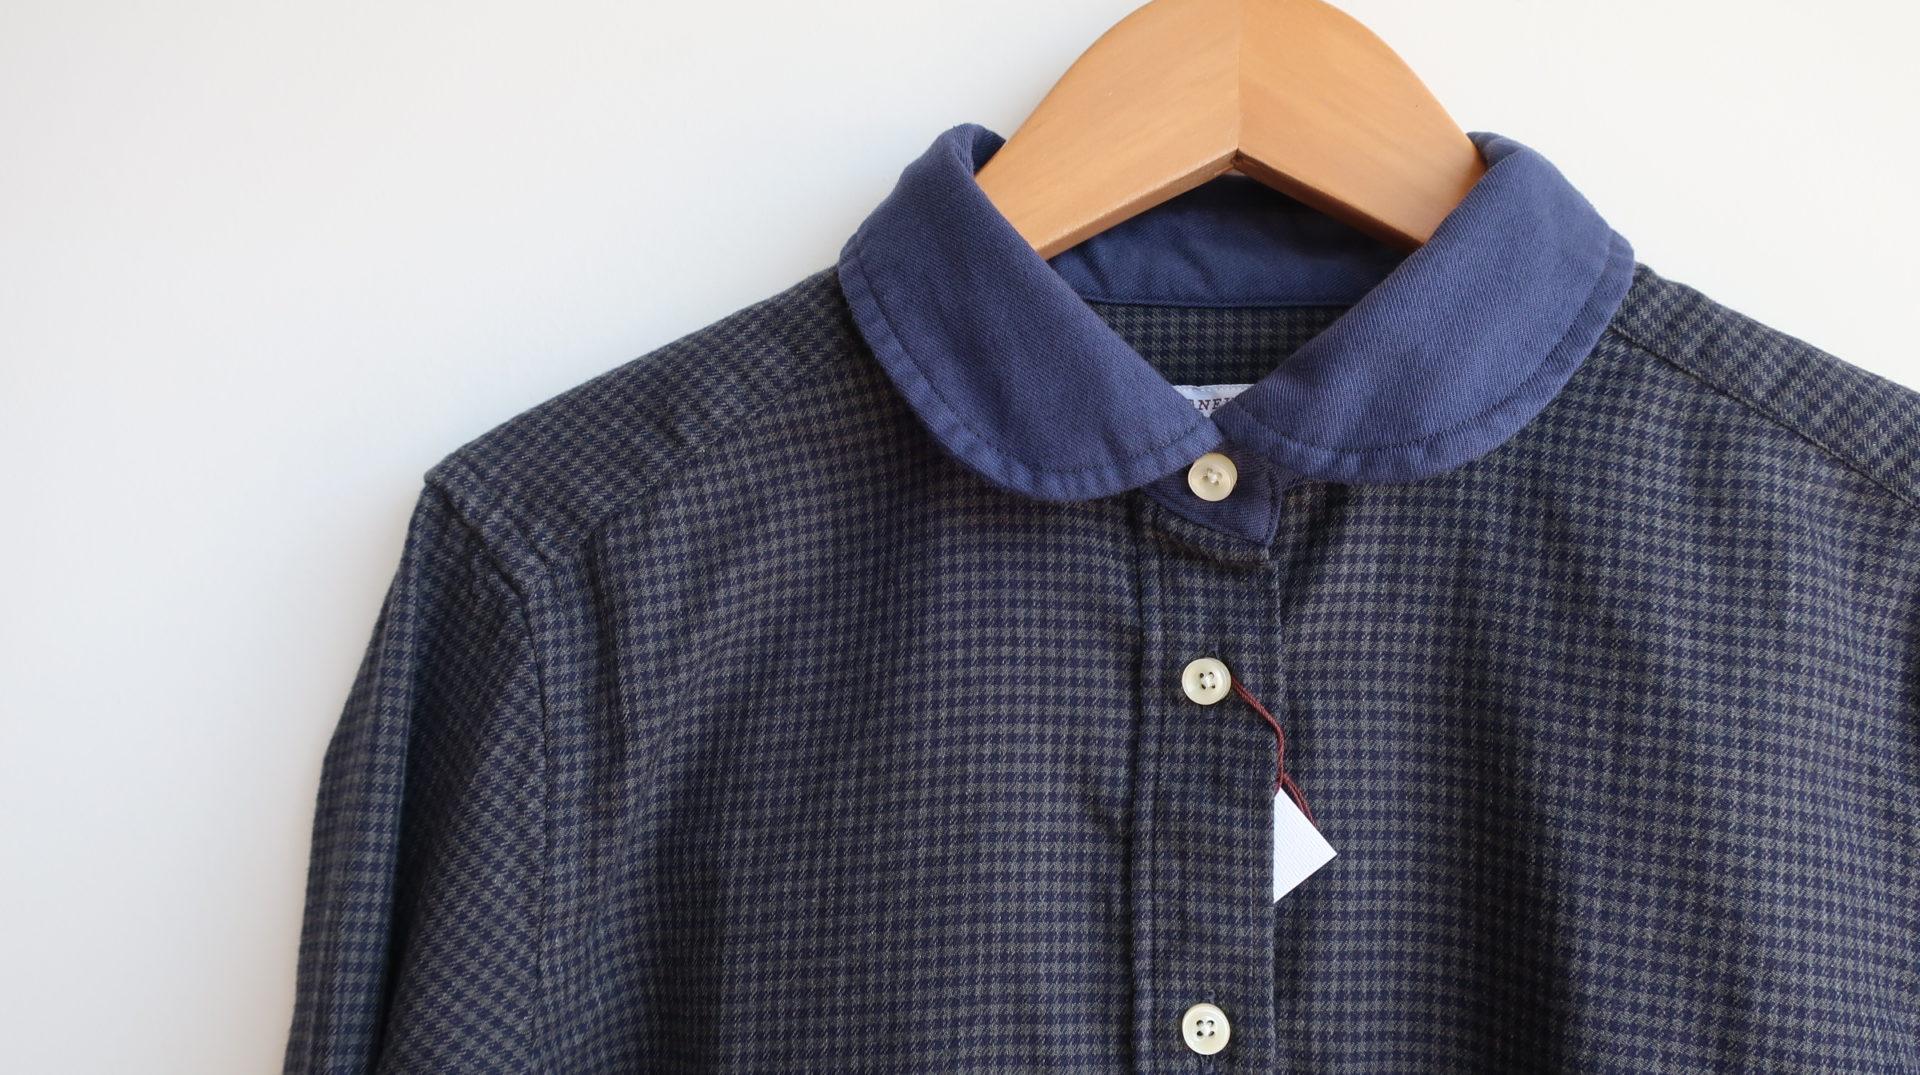 faneuil ツイルチェックラウンドチップカラーシャツ(sold out)